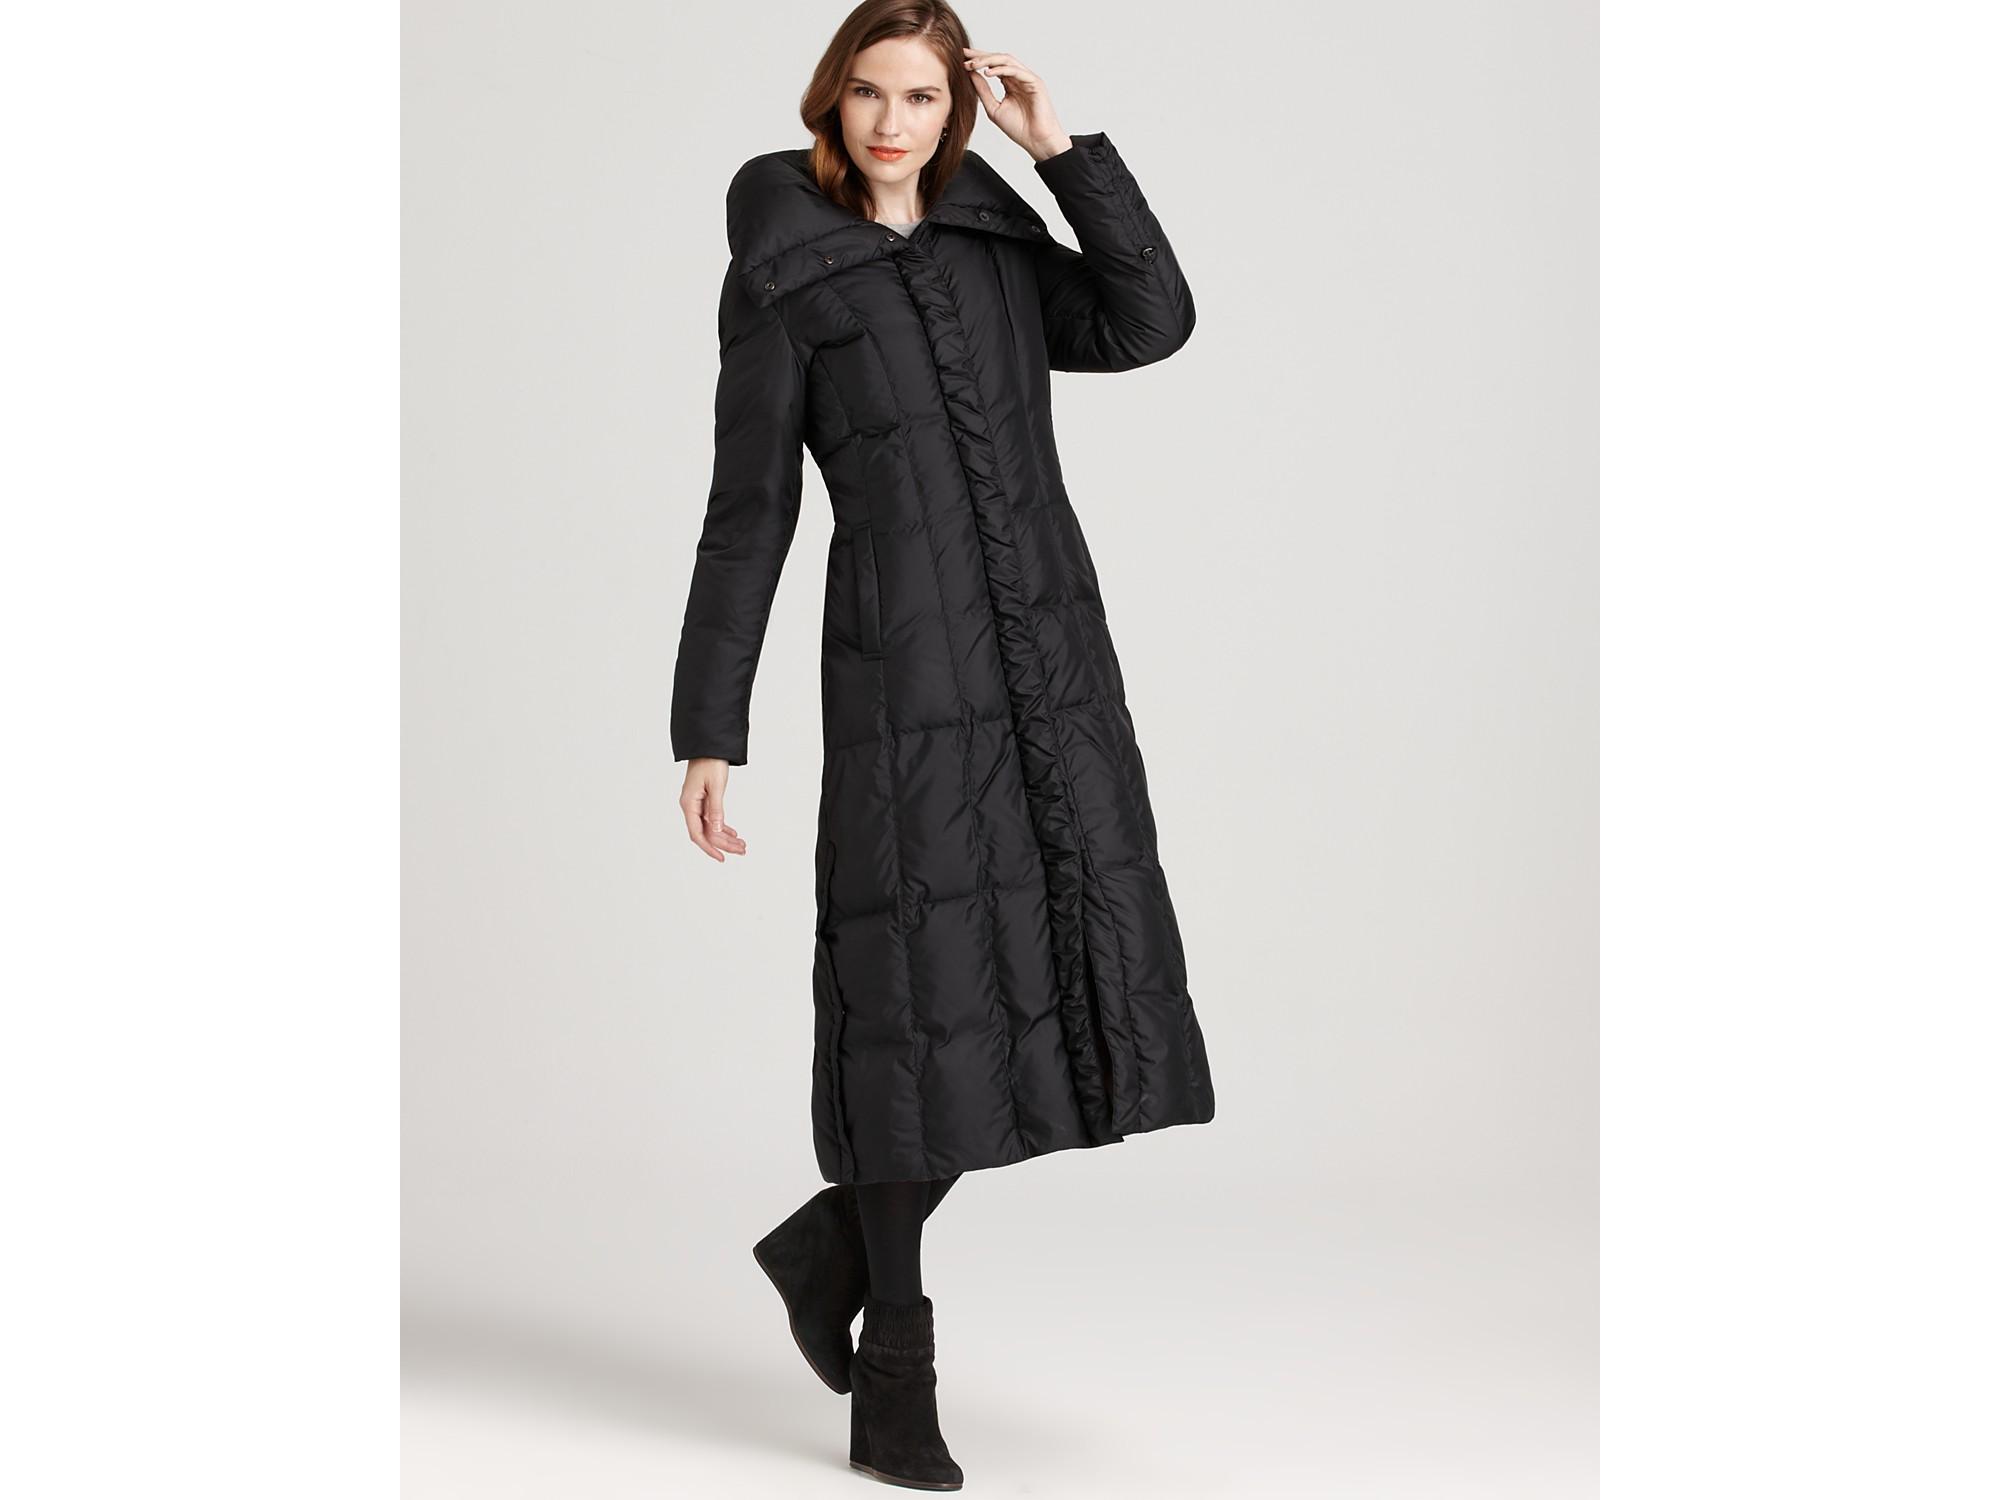 Cole haan Down Maxi Coat in Black | Lyst